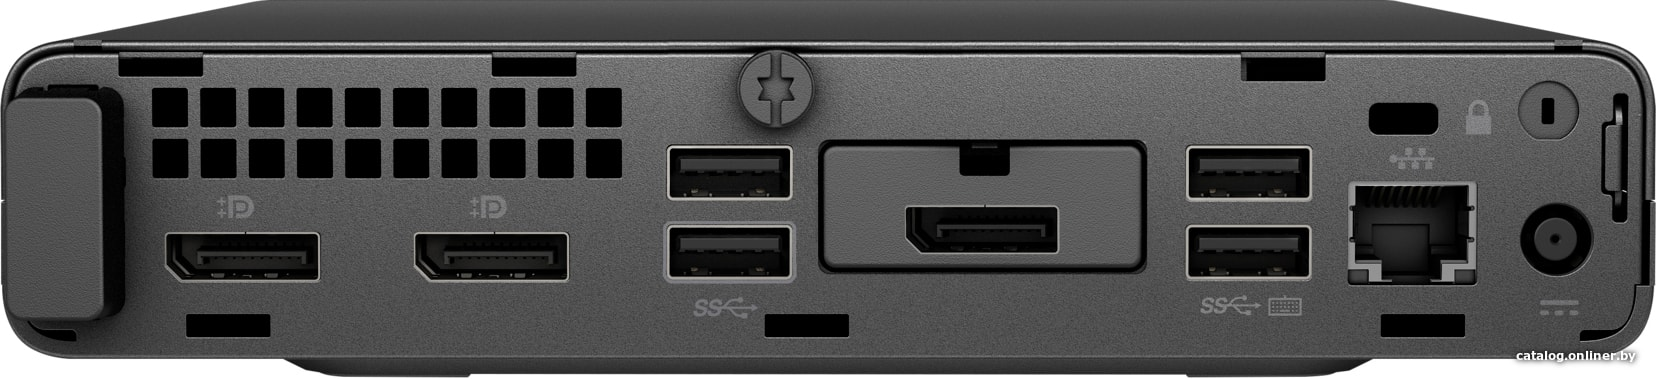 HP ProDesk 600 G5 Desktop Mini 7PF18EA Image #4